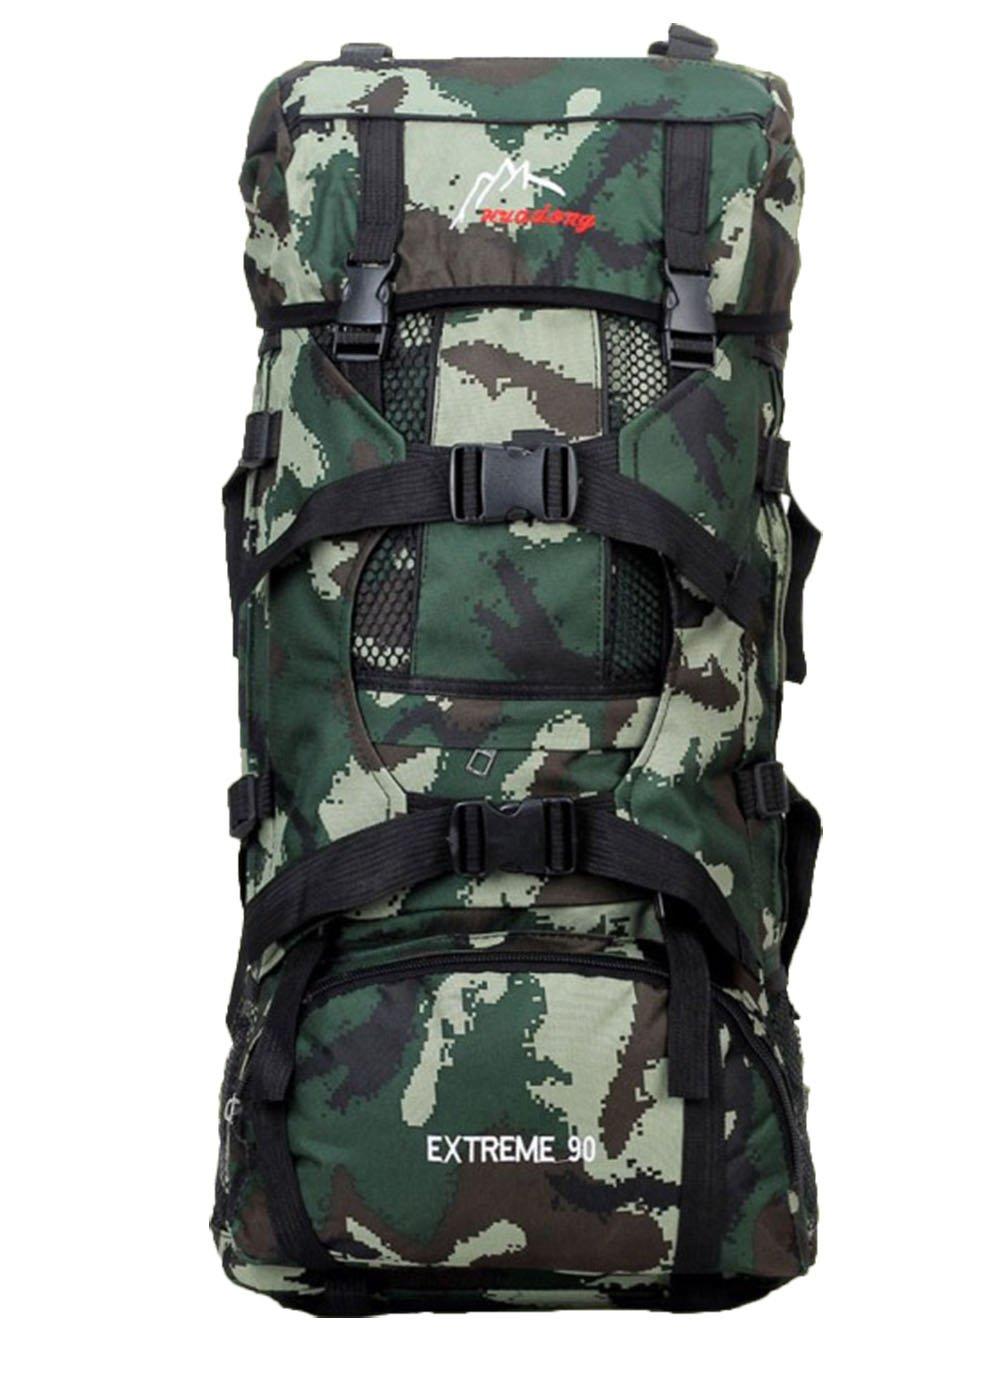 OSdreamスポーツアウトドアMilitary Rucksacks Tactical Molleバックパックキャンプハイキングトレッキングバッグ B00SL3SSLG Dark green camo